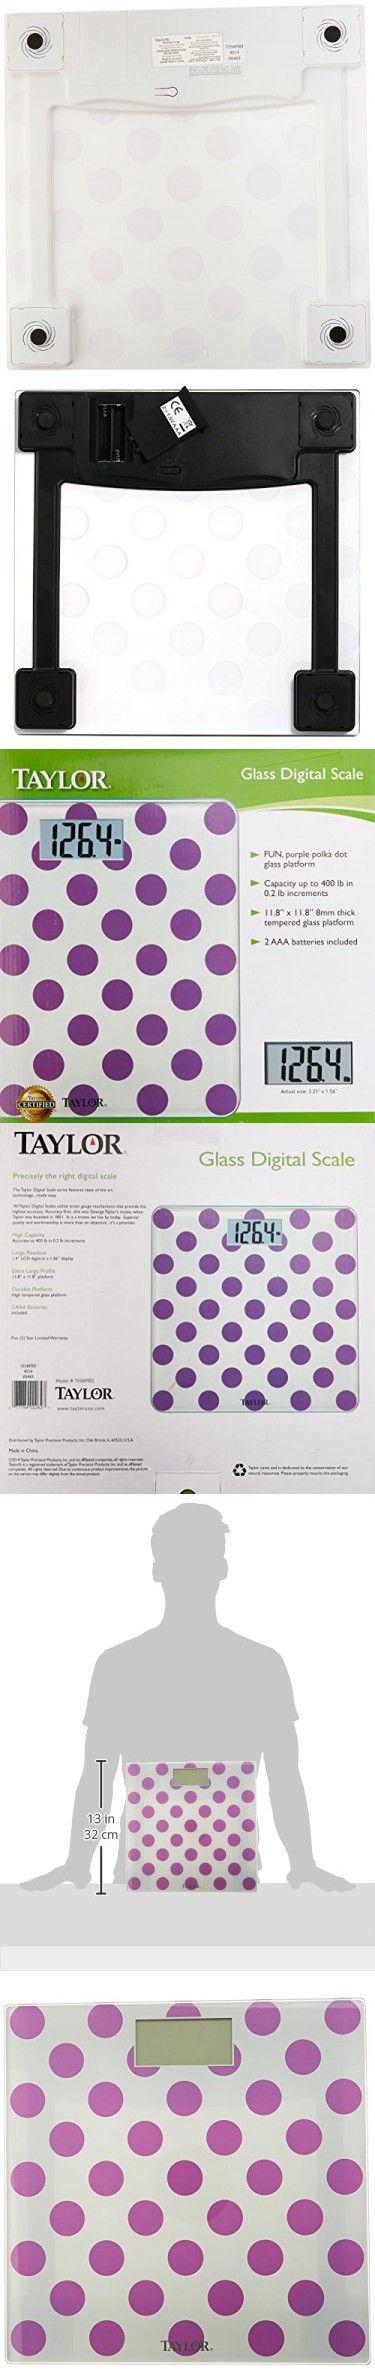 Taylor Precision Products Glass Digital Bath Scale (Polka Dots)